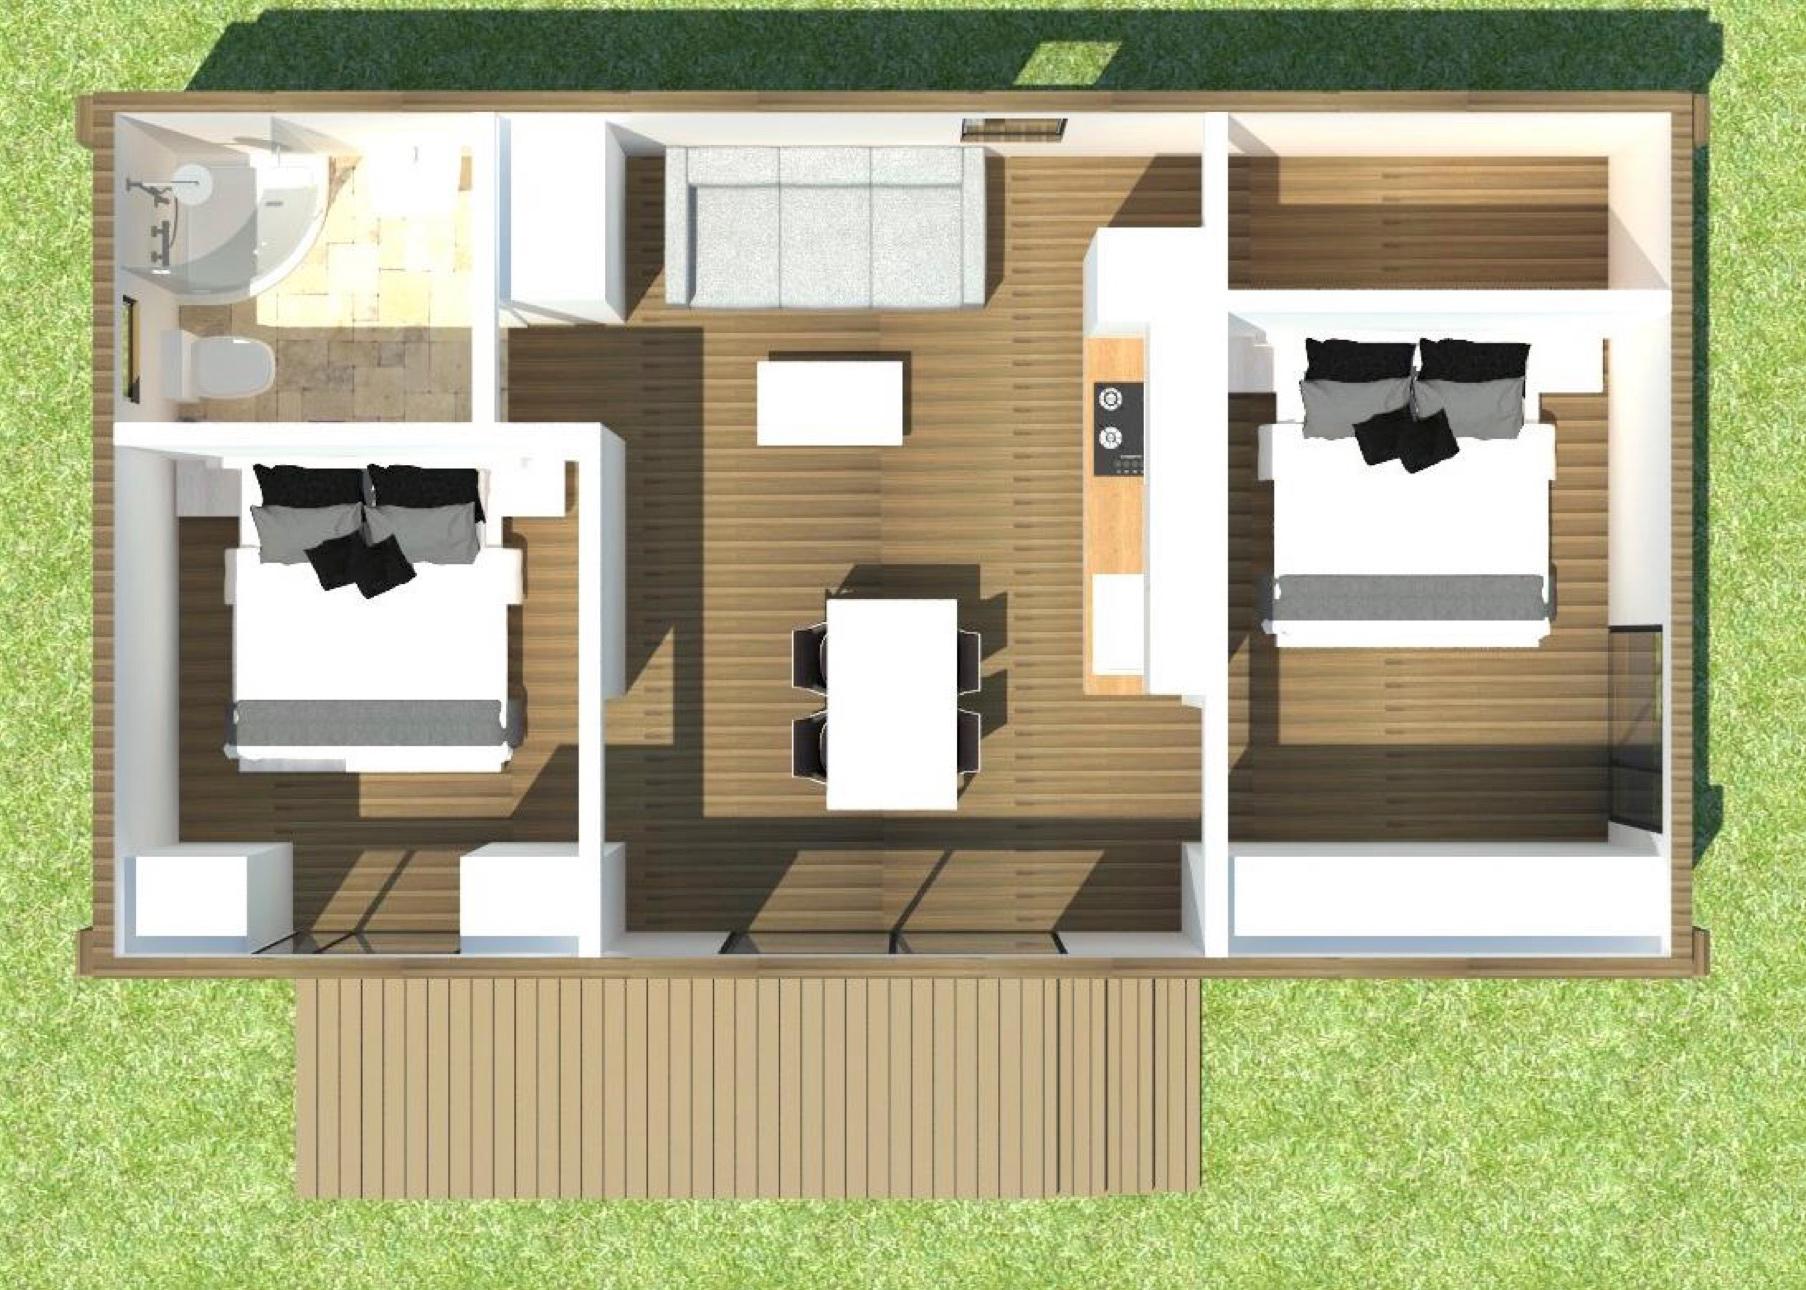 Проект Mobile 42 - план этажа вид сверху